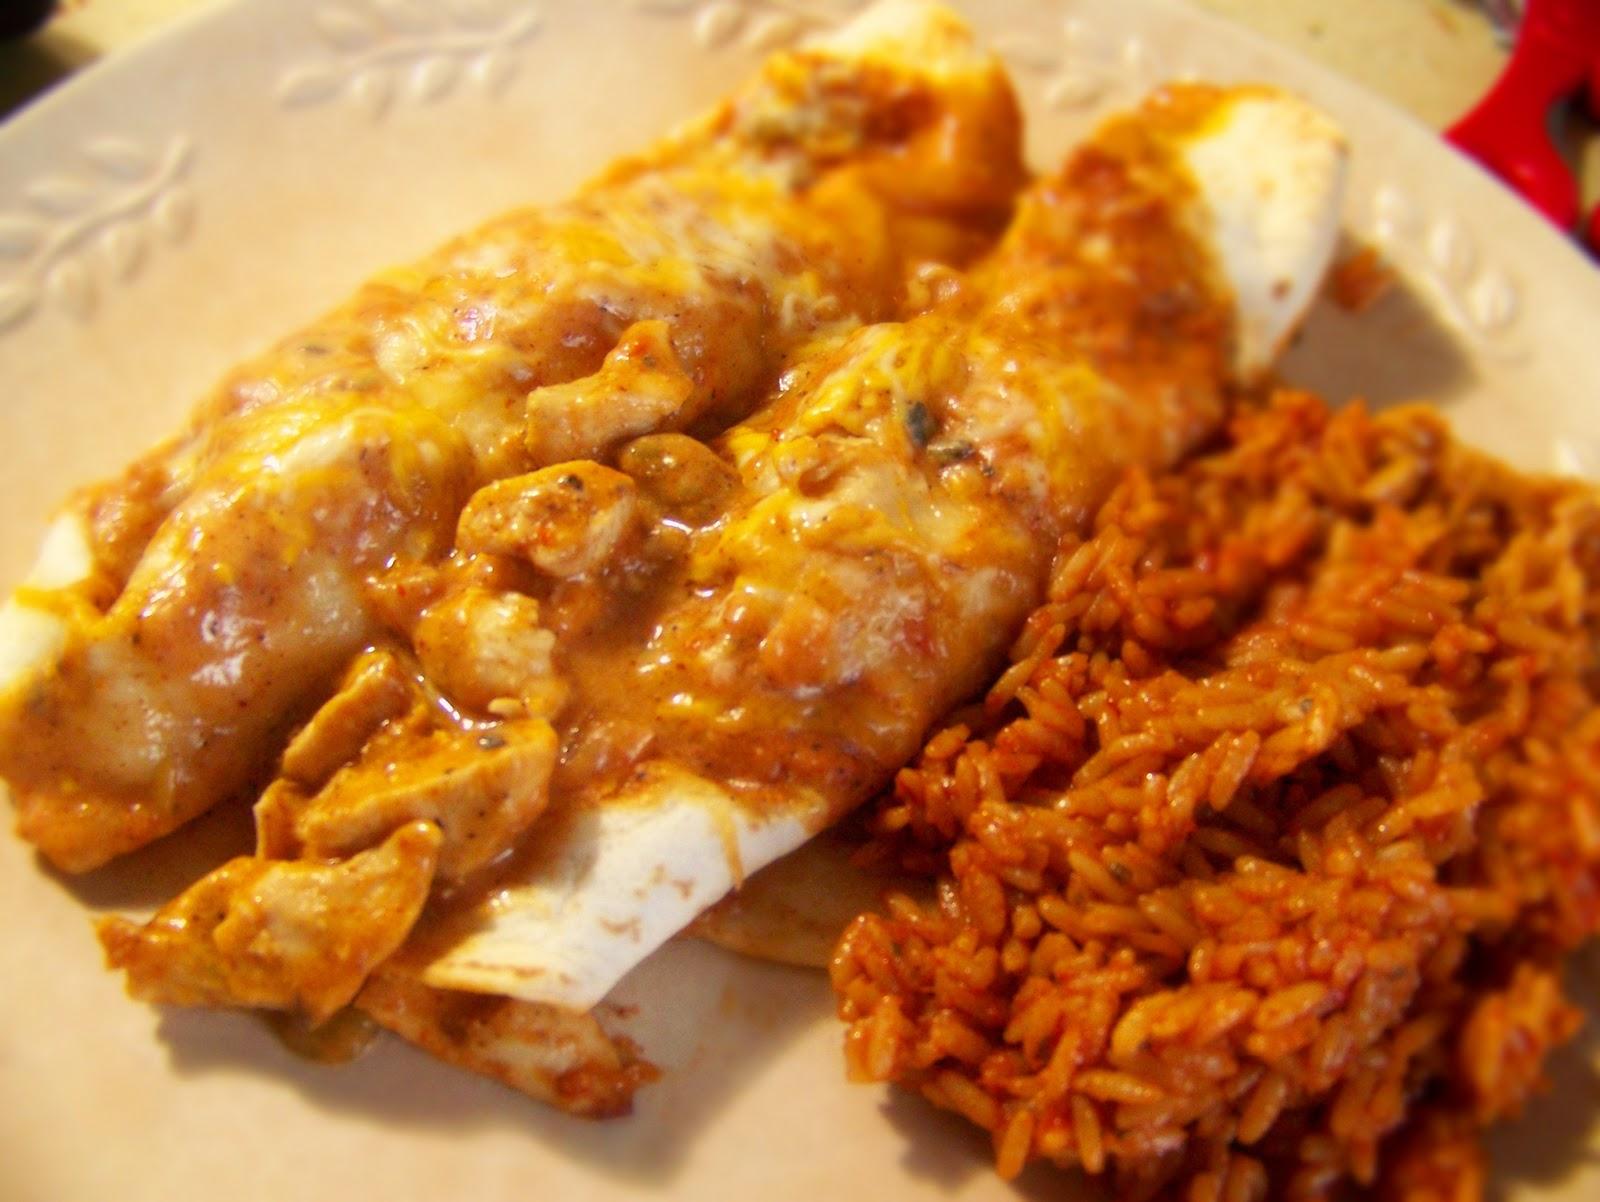 Frazzled Mom's Life: Day 3: Recipe 2- Creamy Chicken Enchiladas